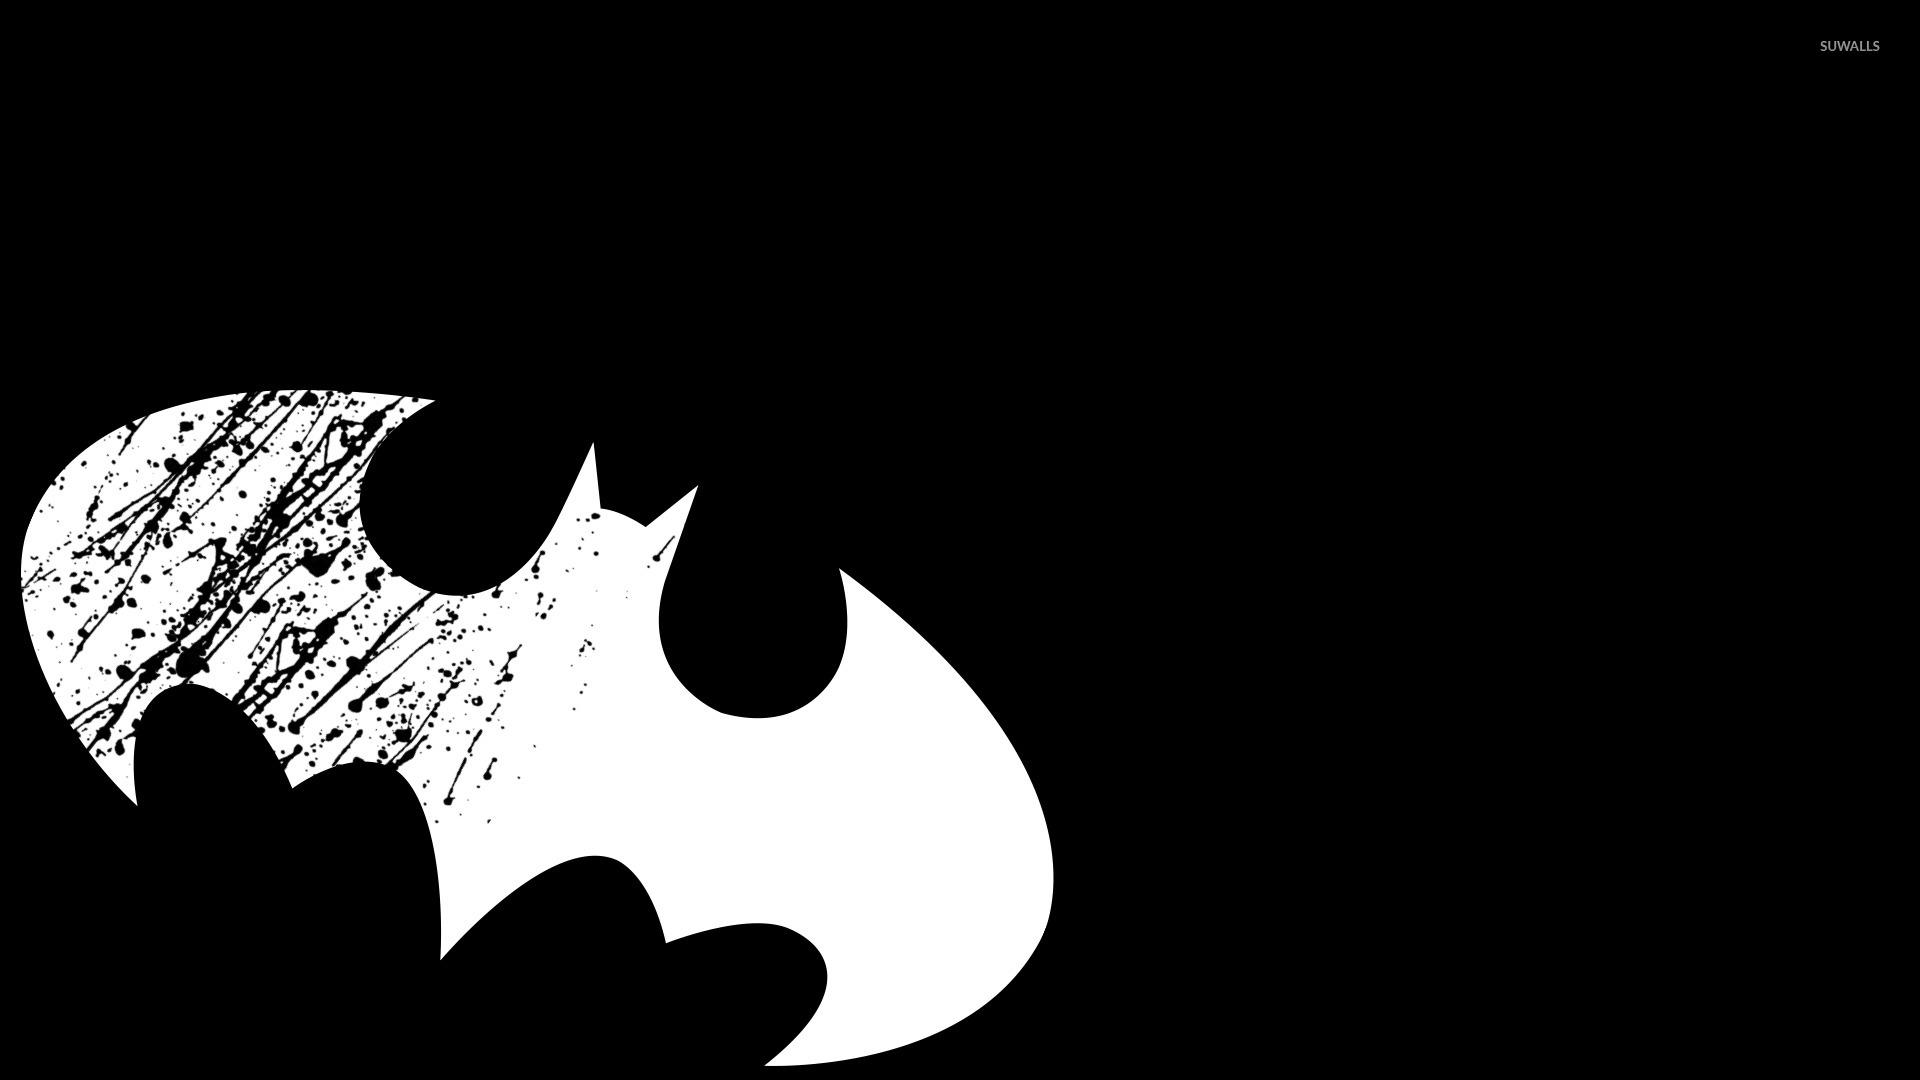 500 batman logo  wallpapers  hd images  vectors free download batman black and white statue batman logo black and white clipart